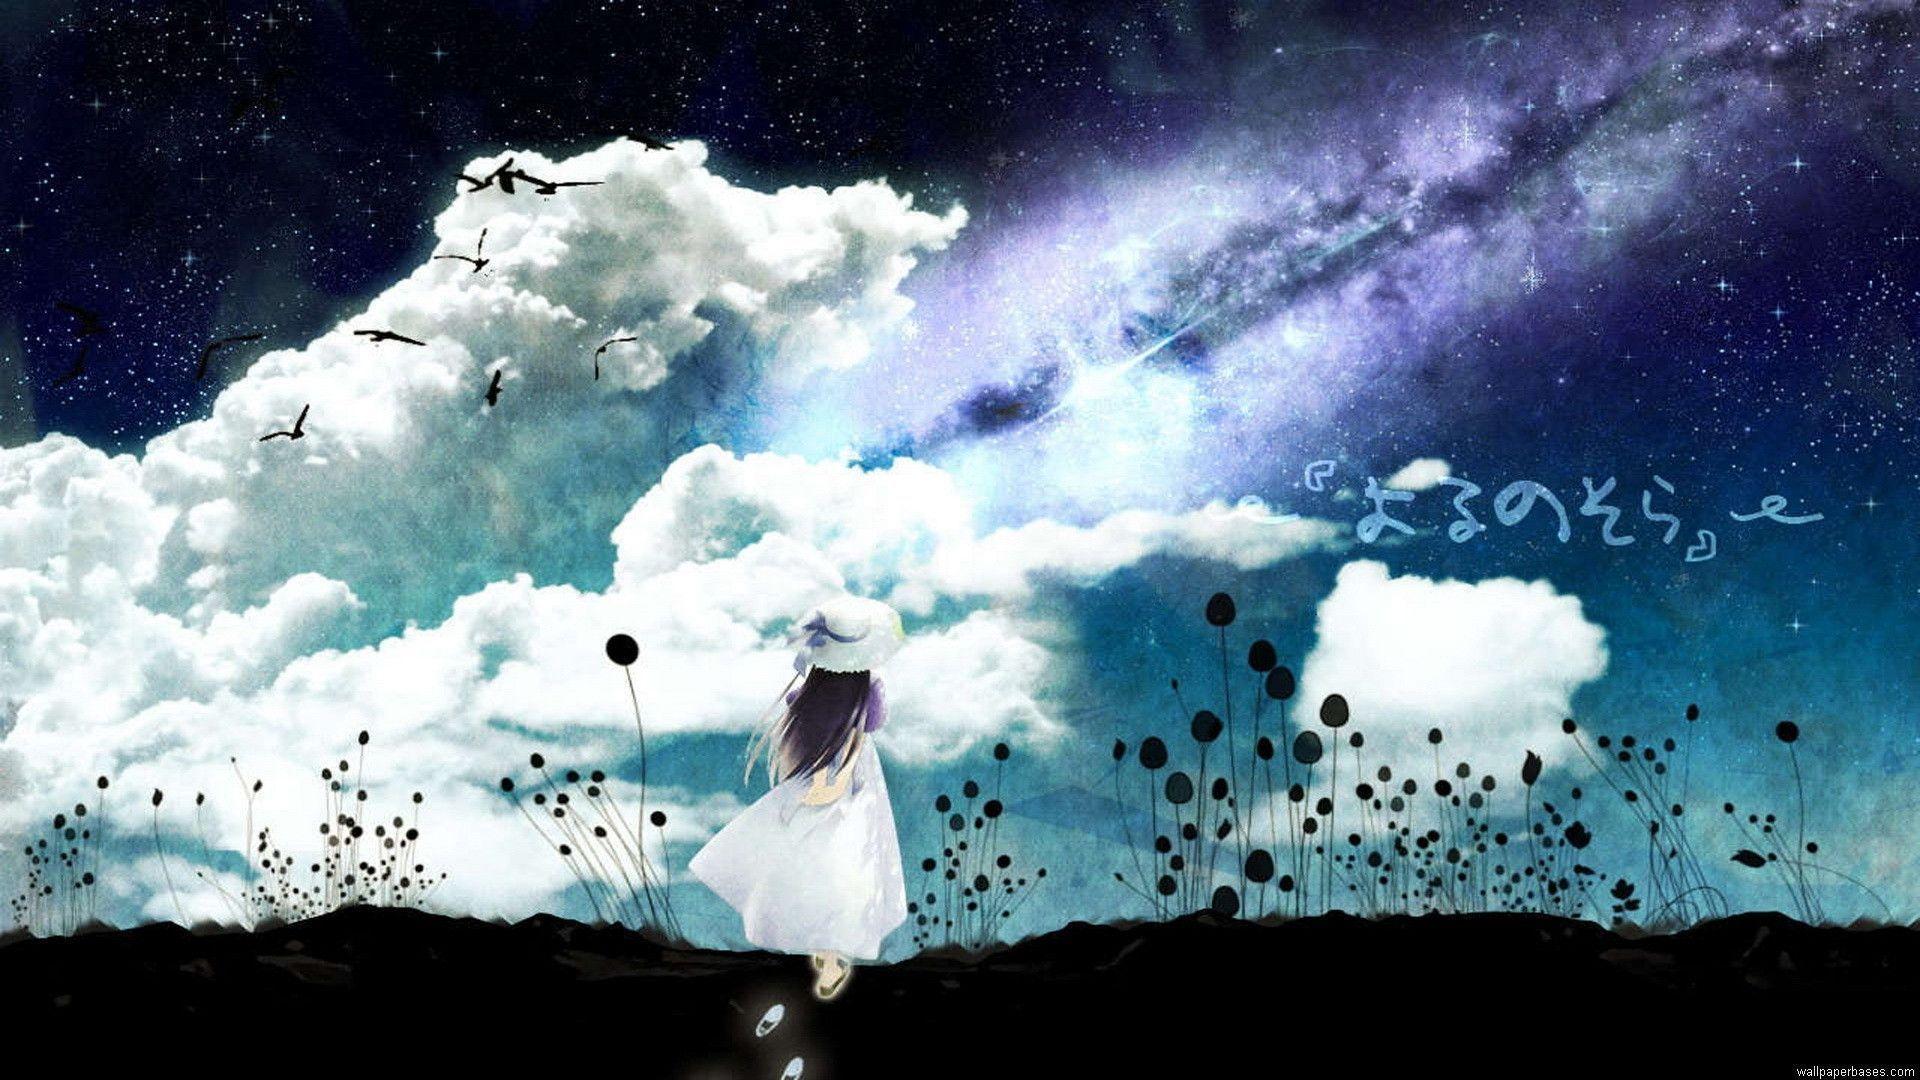 Tumblr iphone wallpaper anime -  Anime Wallpaper Tumblr 1080p Anime Wallpapers Wallpaper Cave